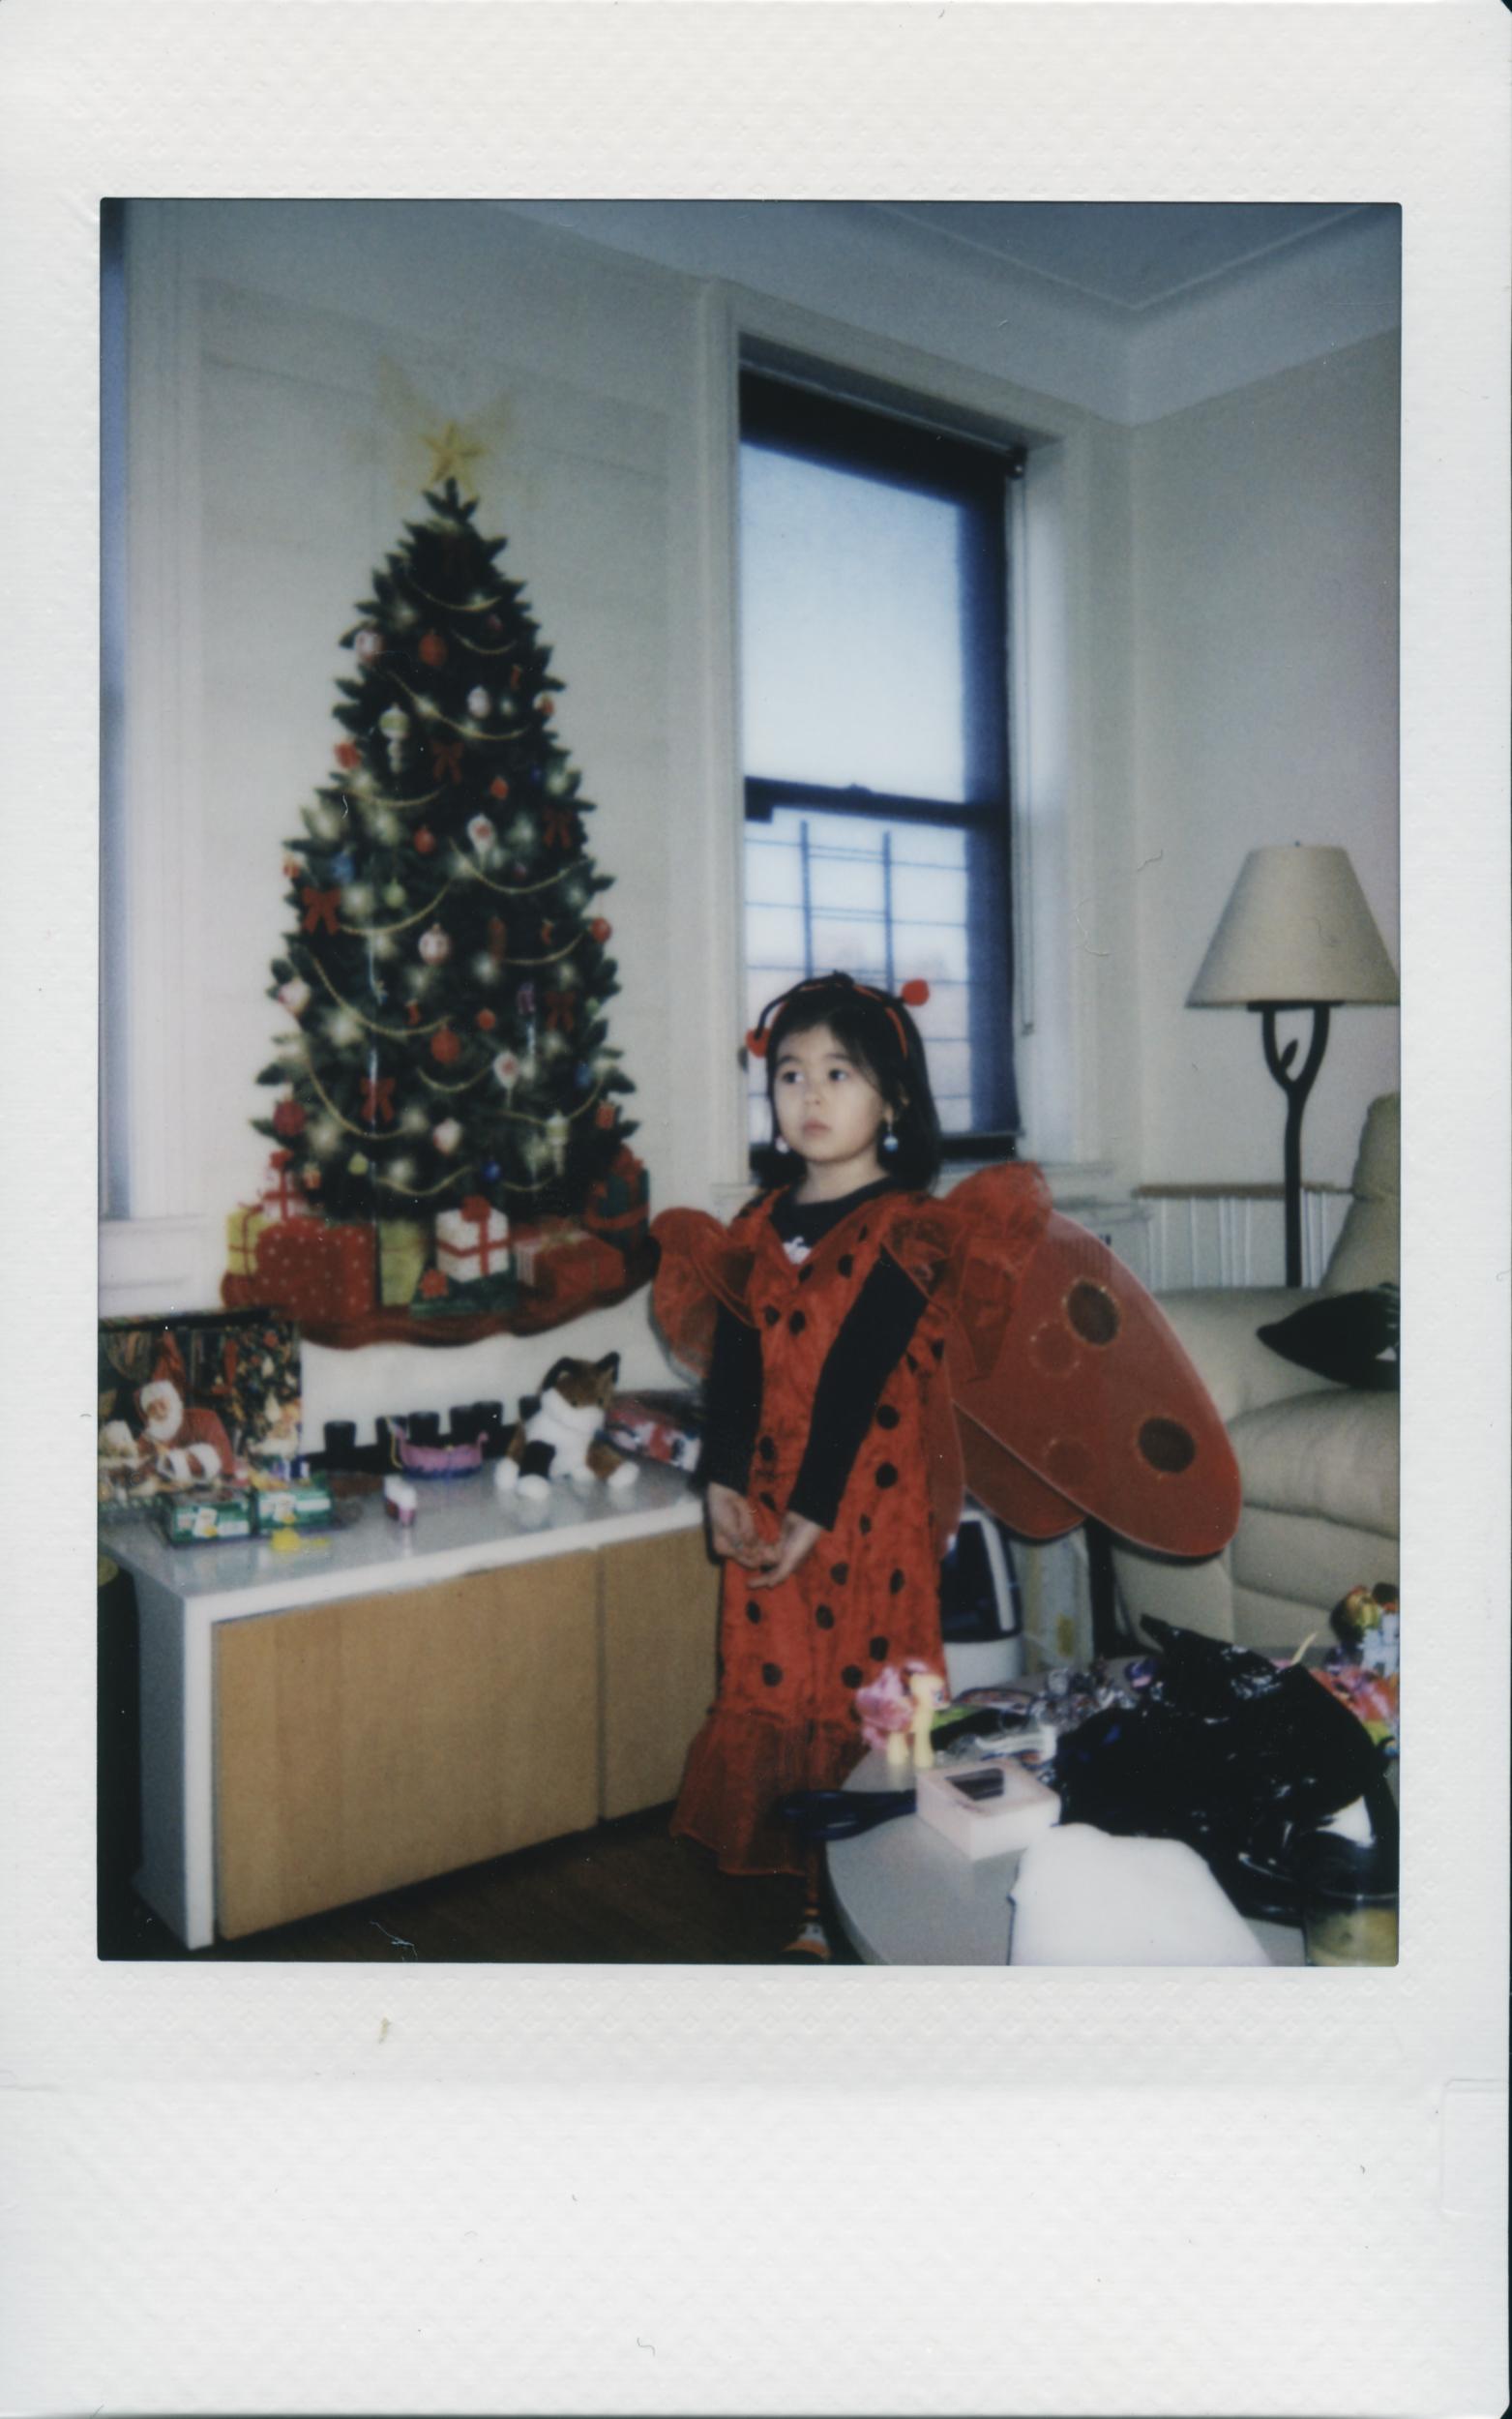 Fuji Hello Kitty instant camera; Fujifilm Instax Mini